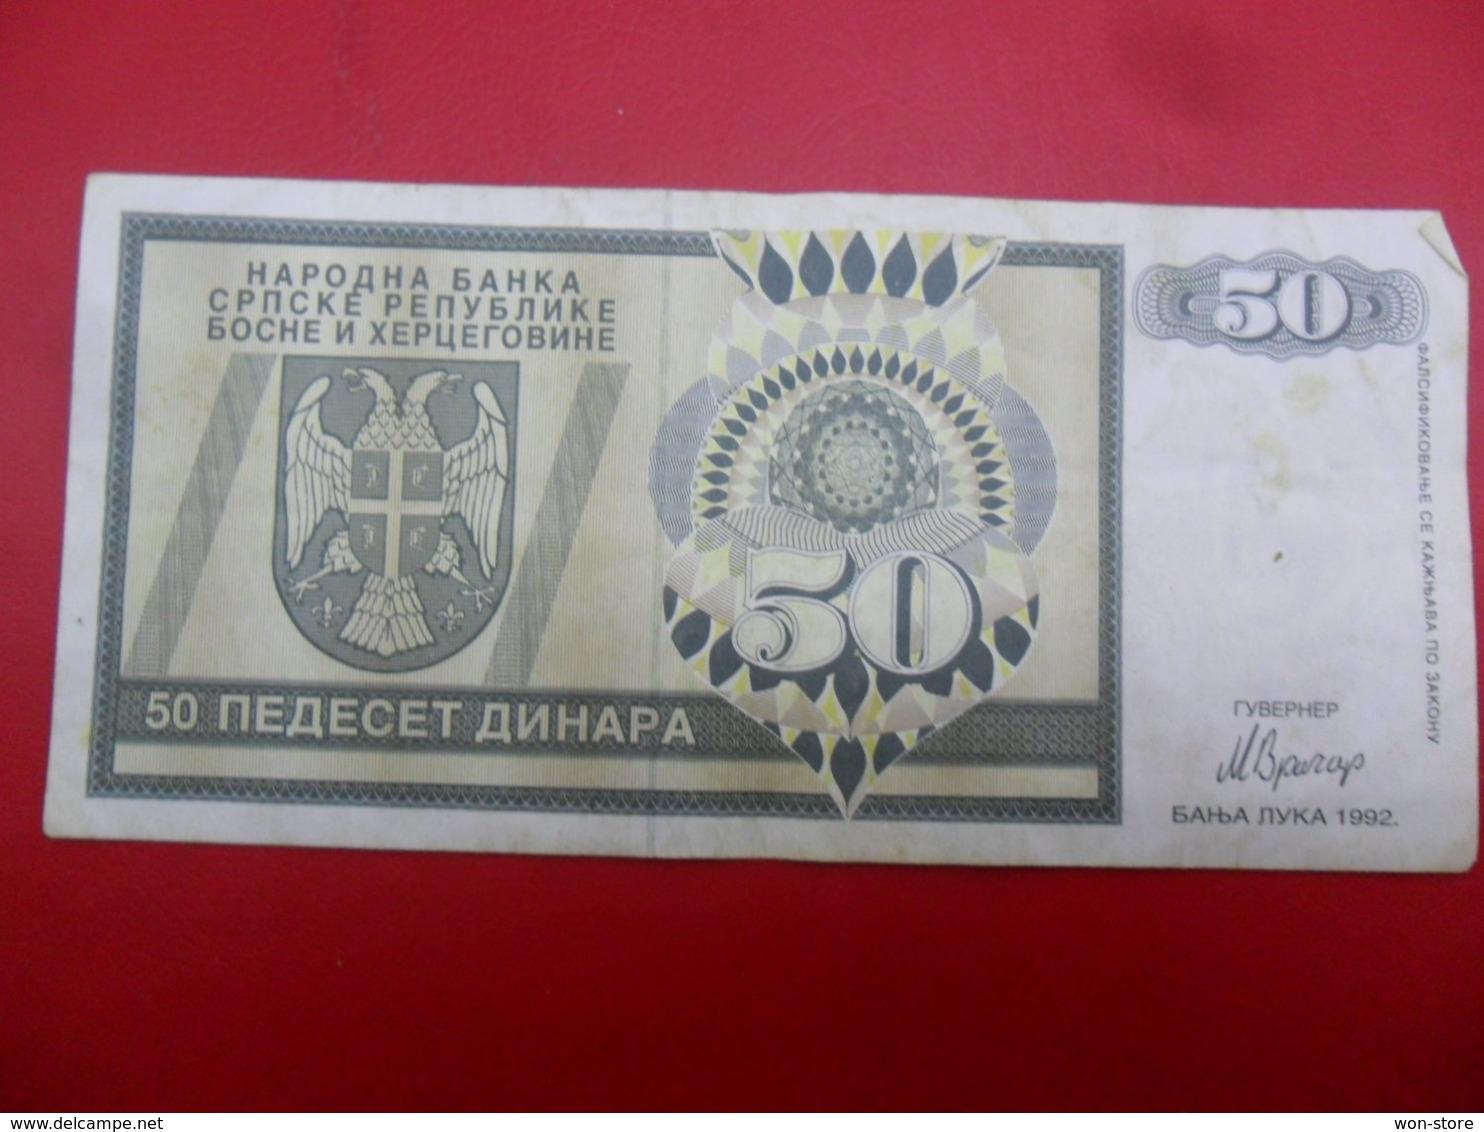 NB Republika Bosna I Hercegovina - Bosnia And Herzegovina 50 Dinara 1992, P-134a, Price For 1 Pcs - Bosnia Erzegovina